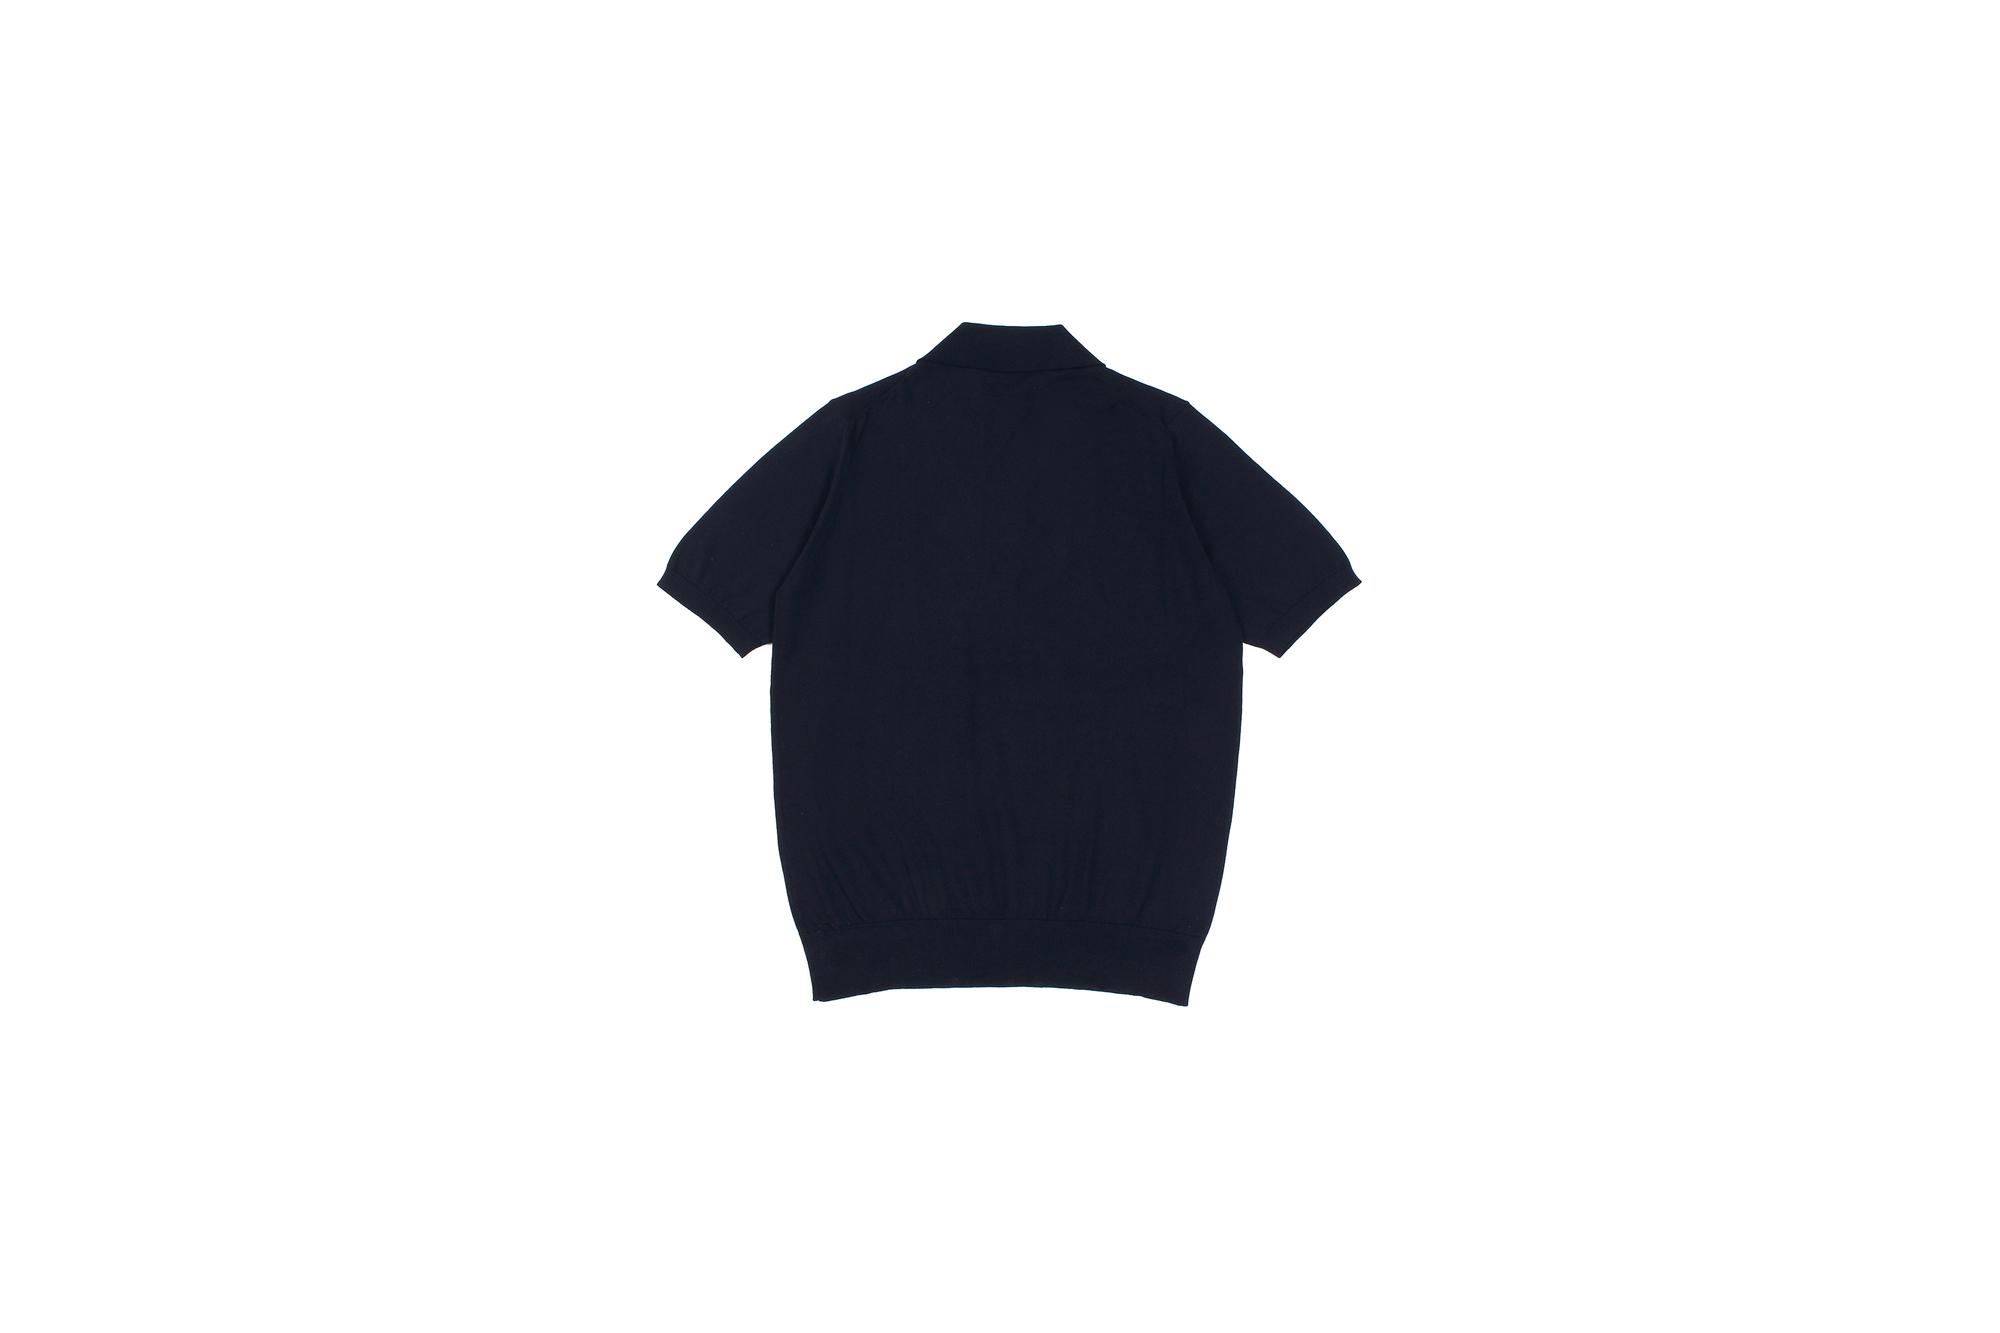 Cruciani(クルチアーニ) 33G Knit Polo Shirt 33ゲージ コットン ニット ポロシャツ NAVY (ネイビー・Z0064) made in italy (イタリア製) 2020 春夏新作 愛知 名古屋 altoediritto アルトエデリット